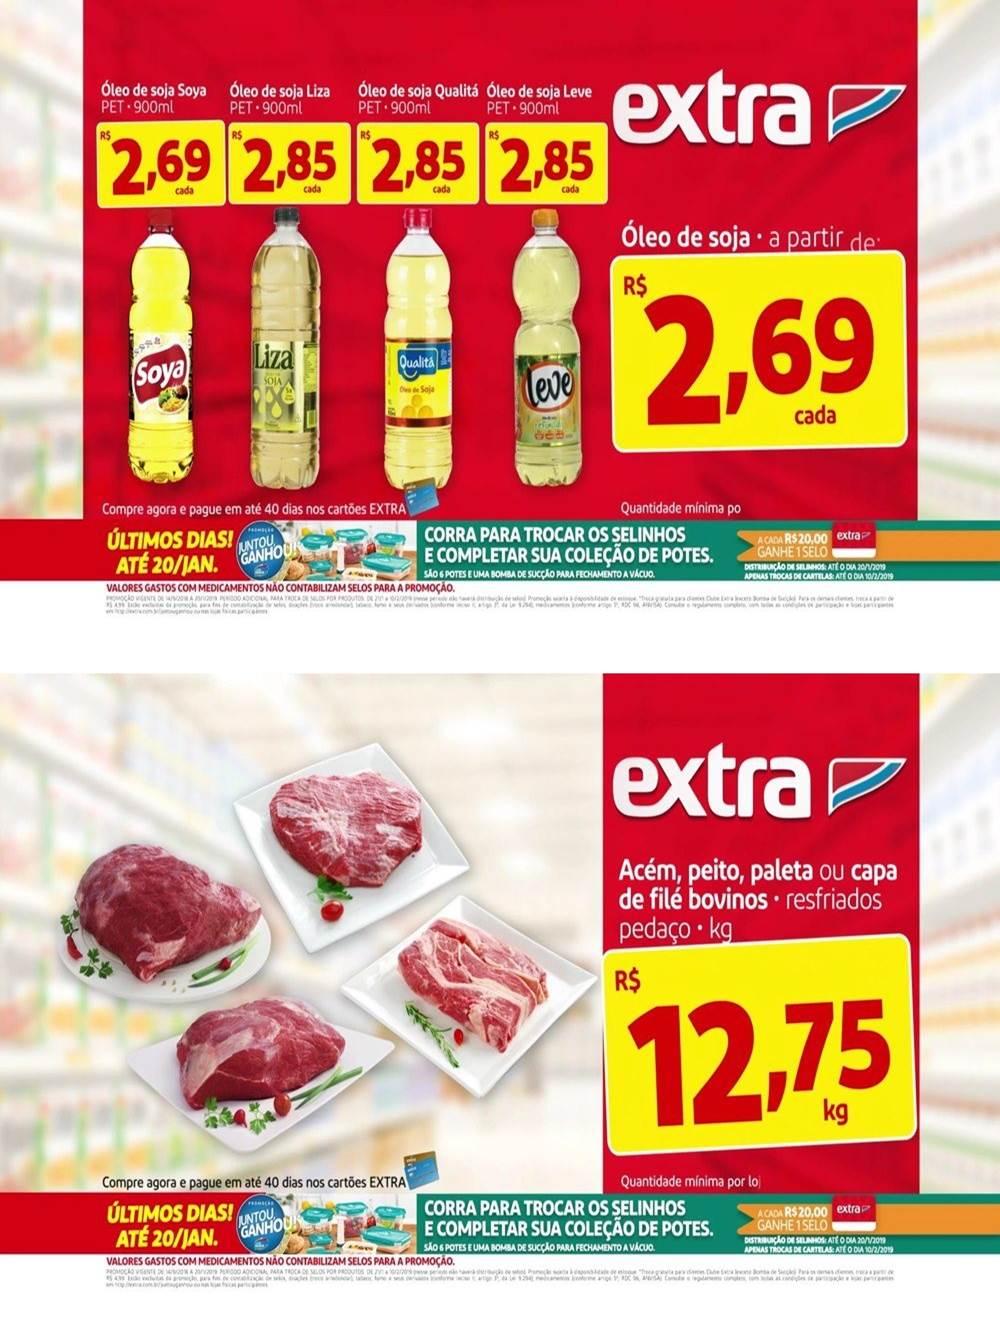 Ofertas-Zaffari1-1 Ofertas de Supermercados - Economize!